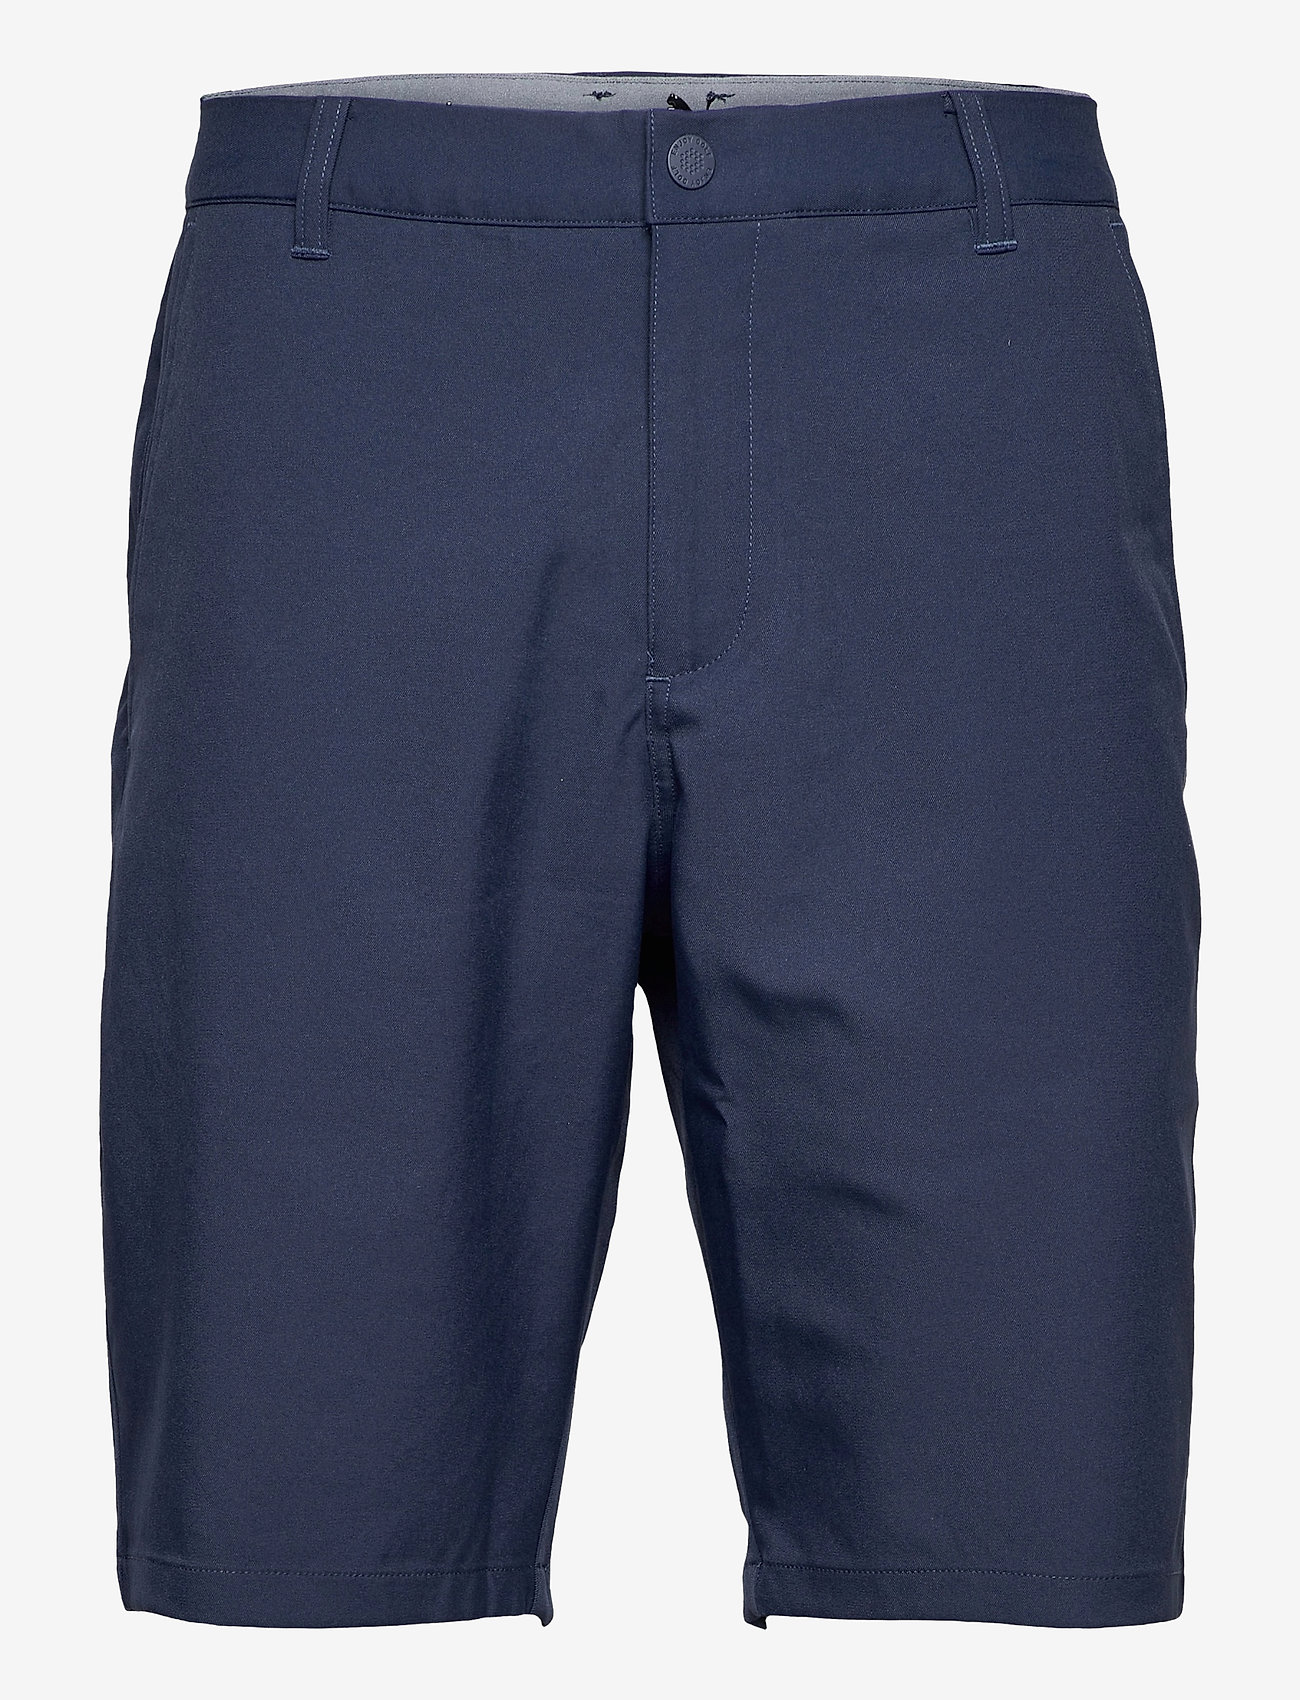 PUMA Golf - Jackpot Short - golf shorts - navy blazer - 0